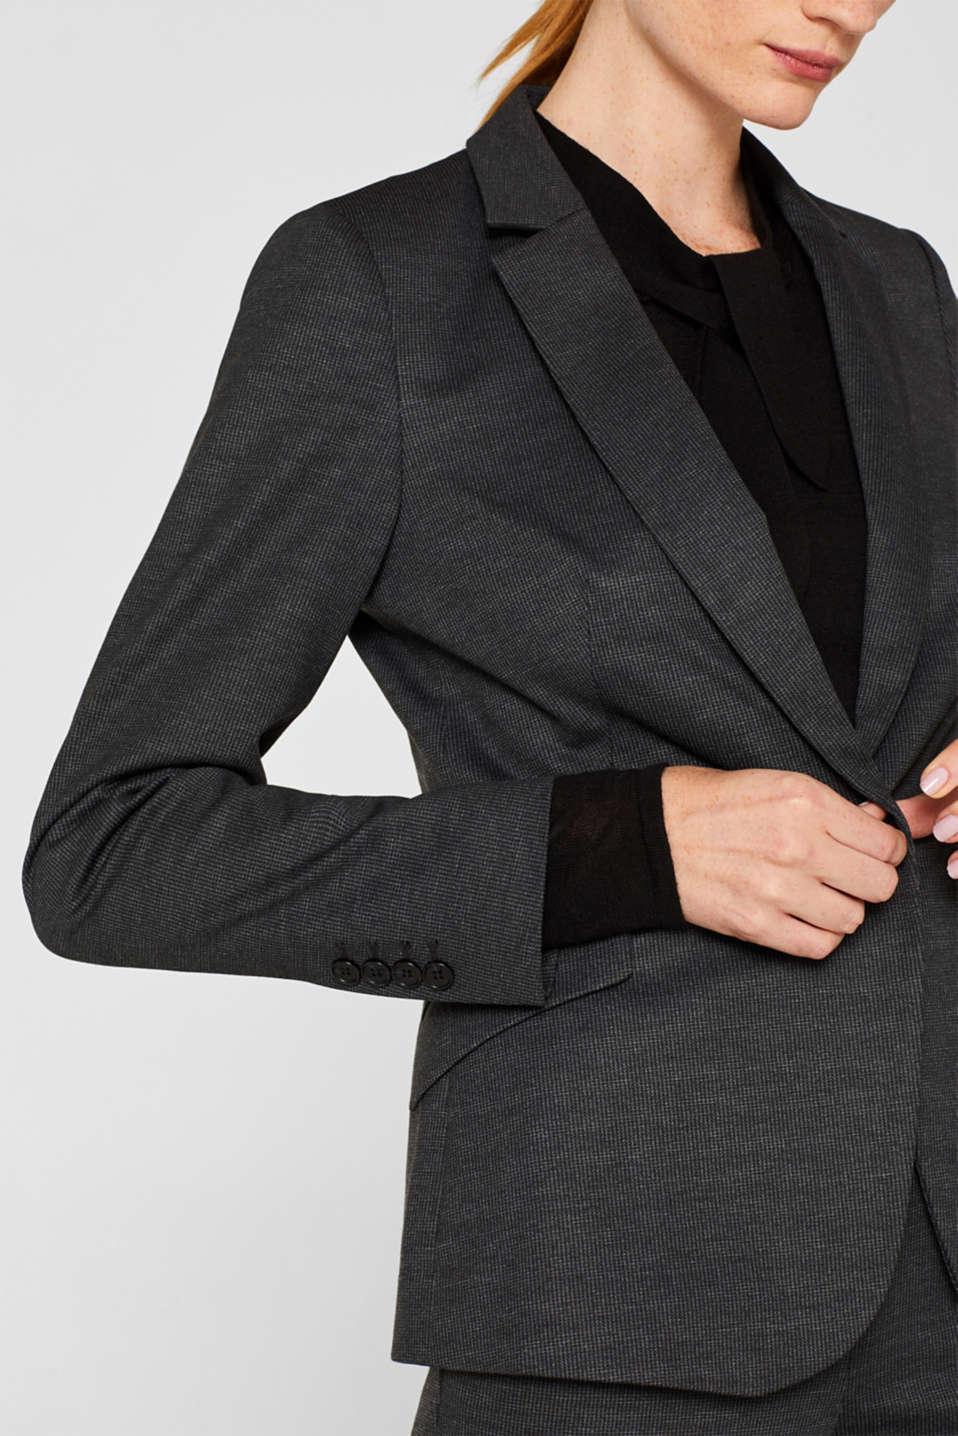 MINI CHECK mix + match stretch blazer, ANTHRACITE, detail image number 2